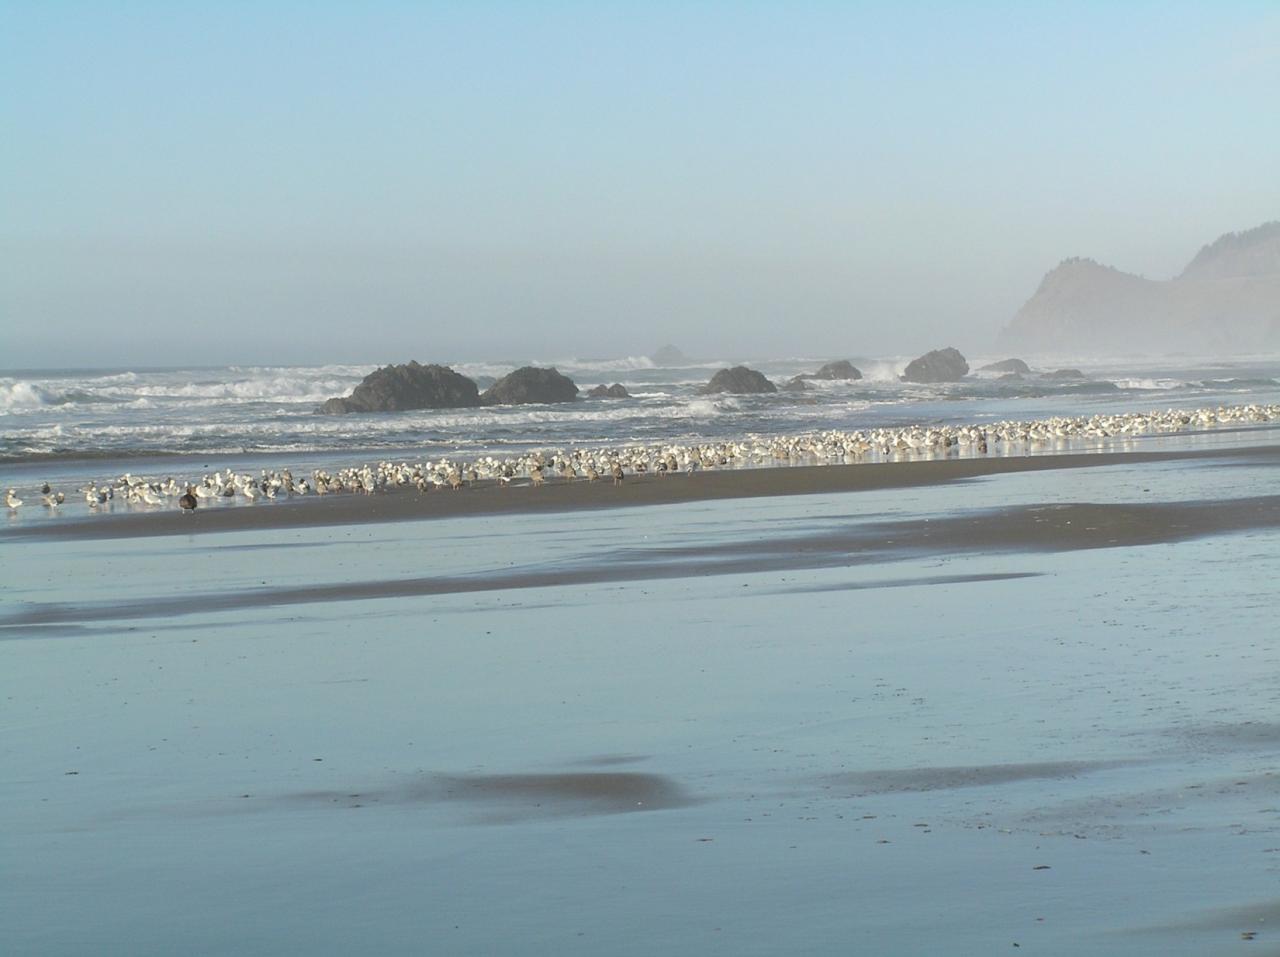 One of three flocks of gulls.